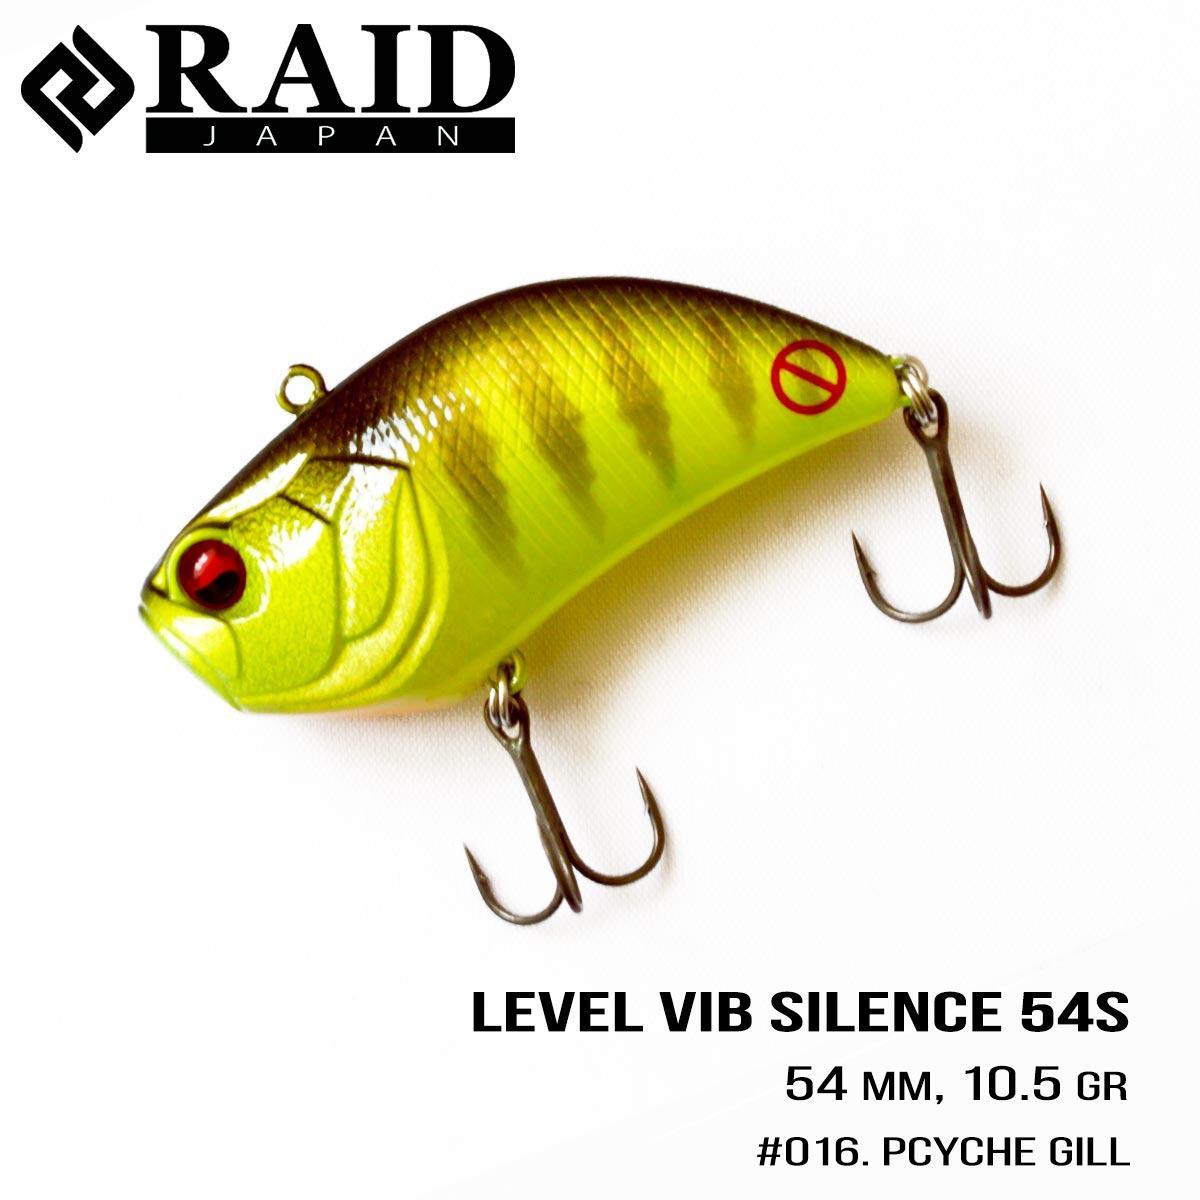 Воблер Raid Level Vib Silence (54mm, 10.5g) (016 Pcyche Gill)